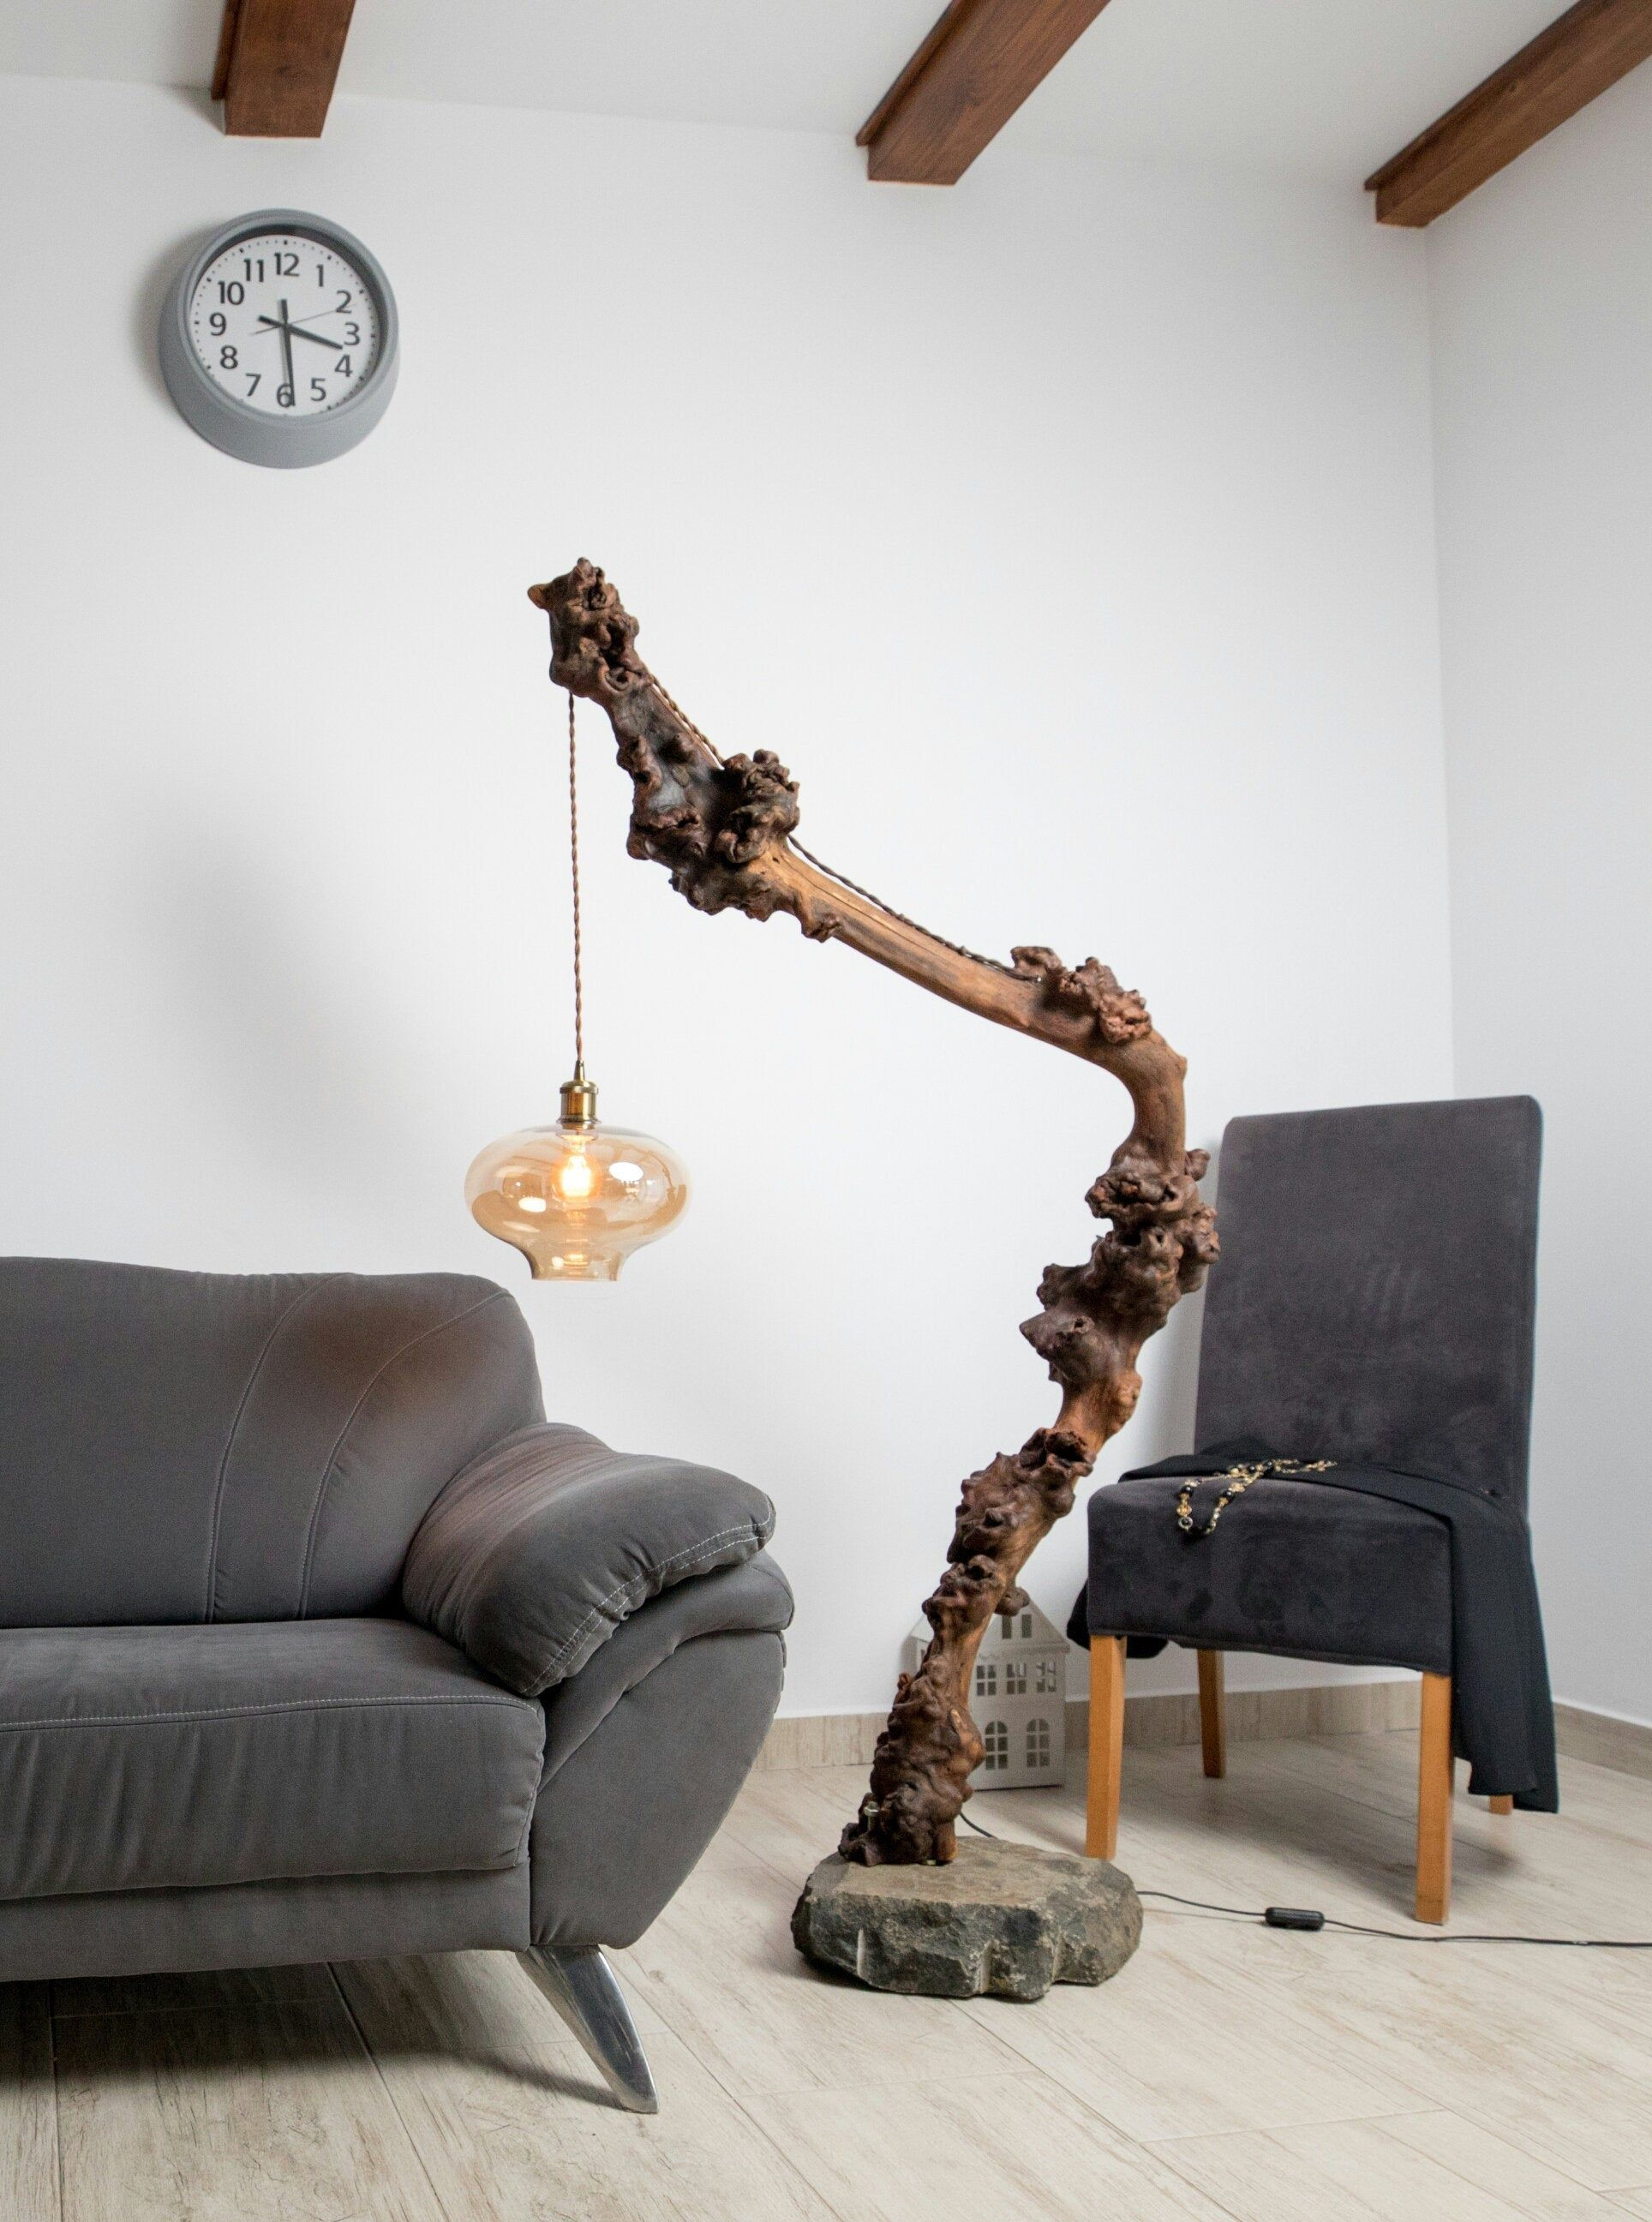 Floor Lamp Wood Lighting Rustic Lighting Wild Wood Lamp Living Room Lamp Modern Decor